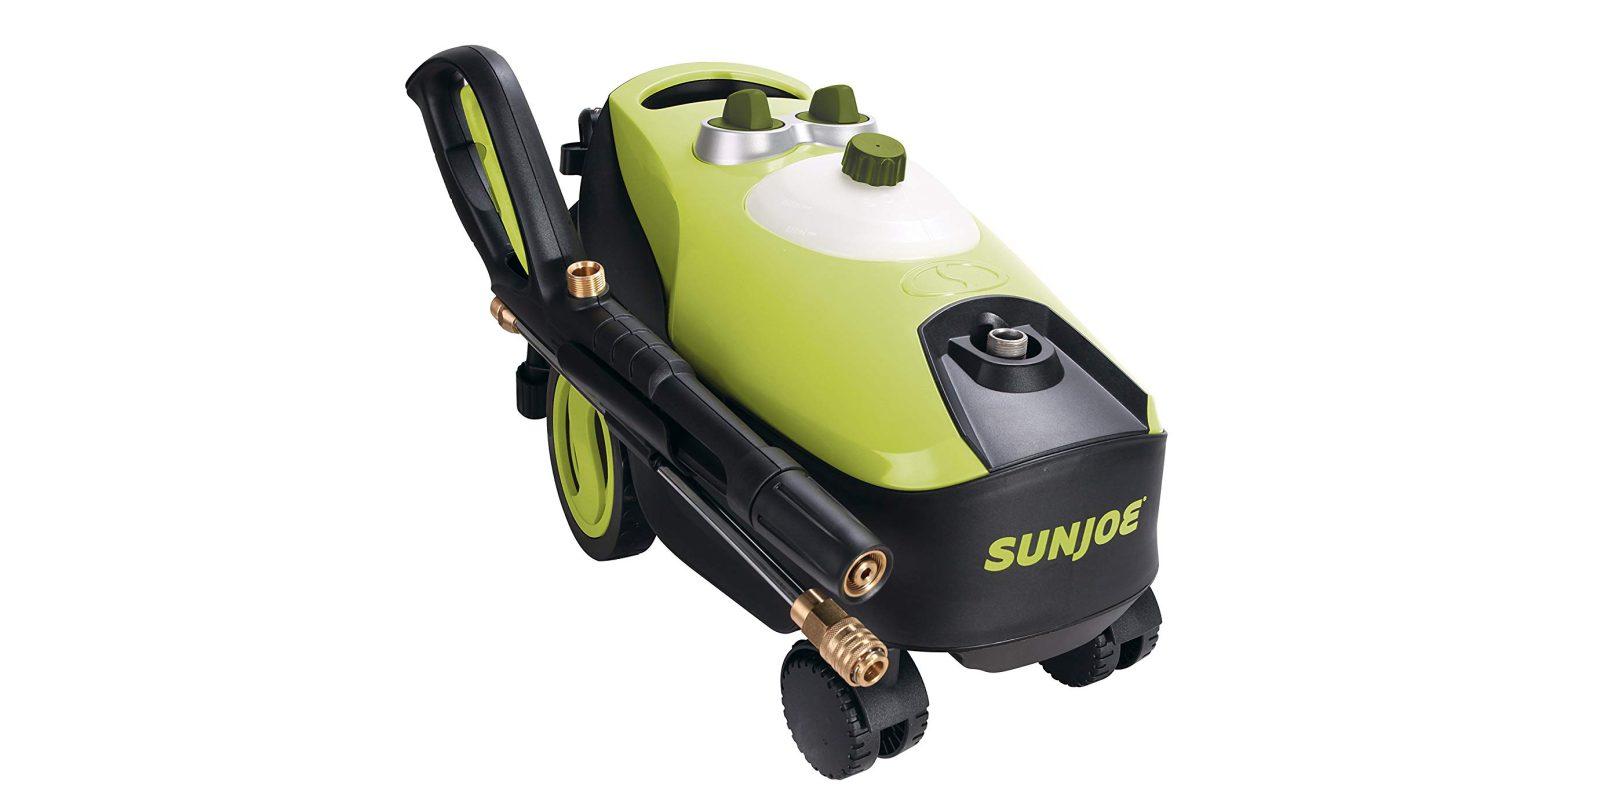 Wednesday's best Green Deals: Sun Joe Electric Pressure